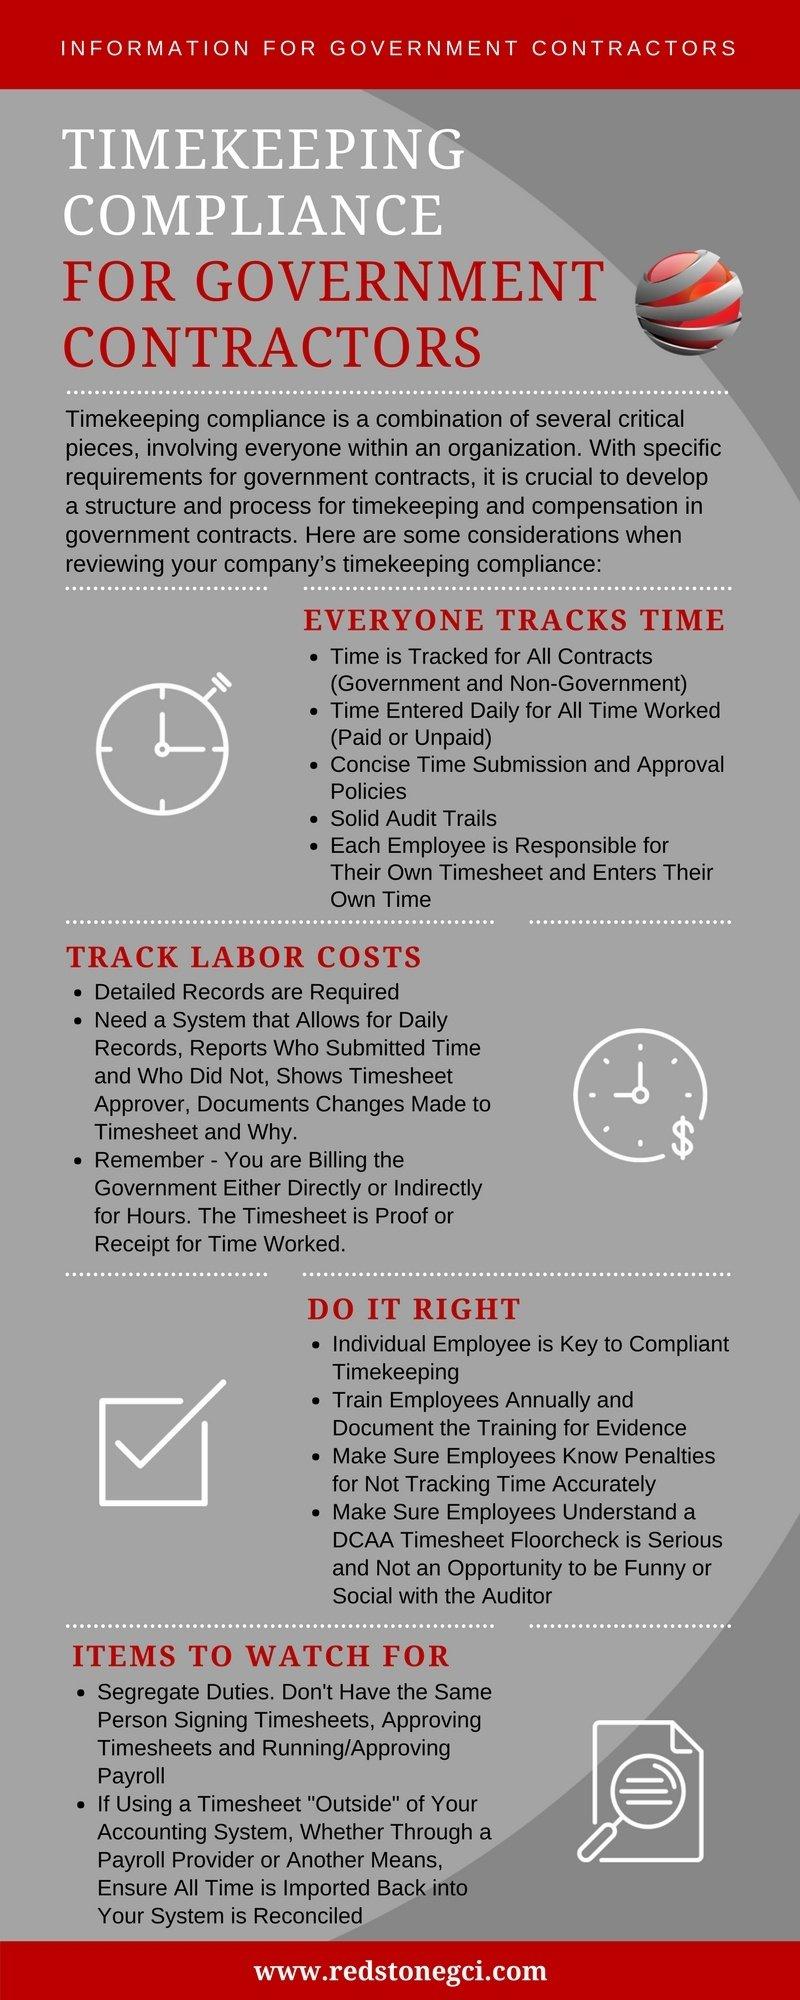 RGCI-Payroll Refresher 002-Infographic.jpg